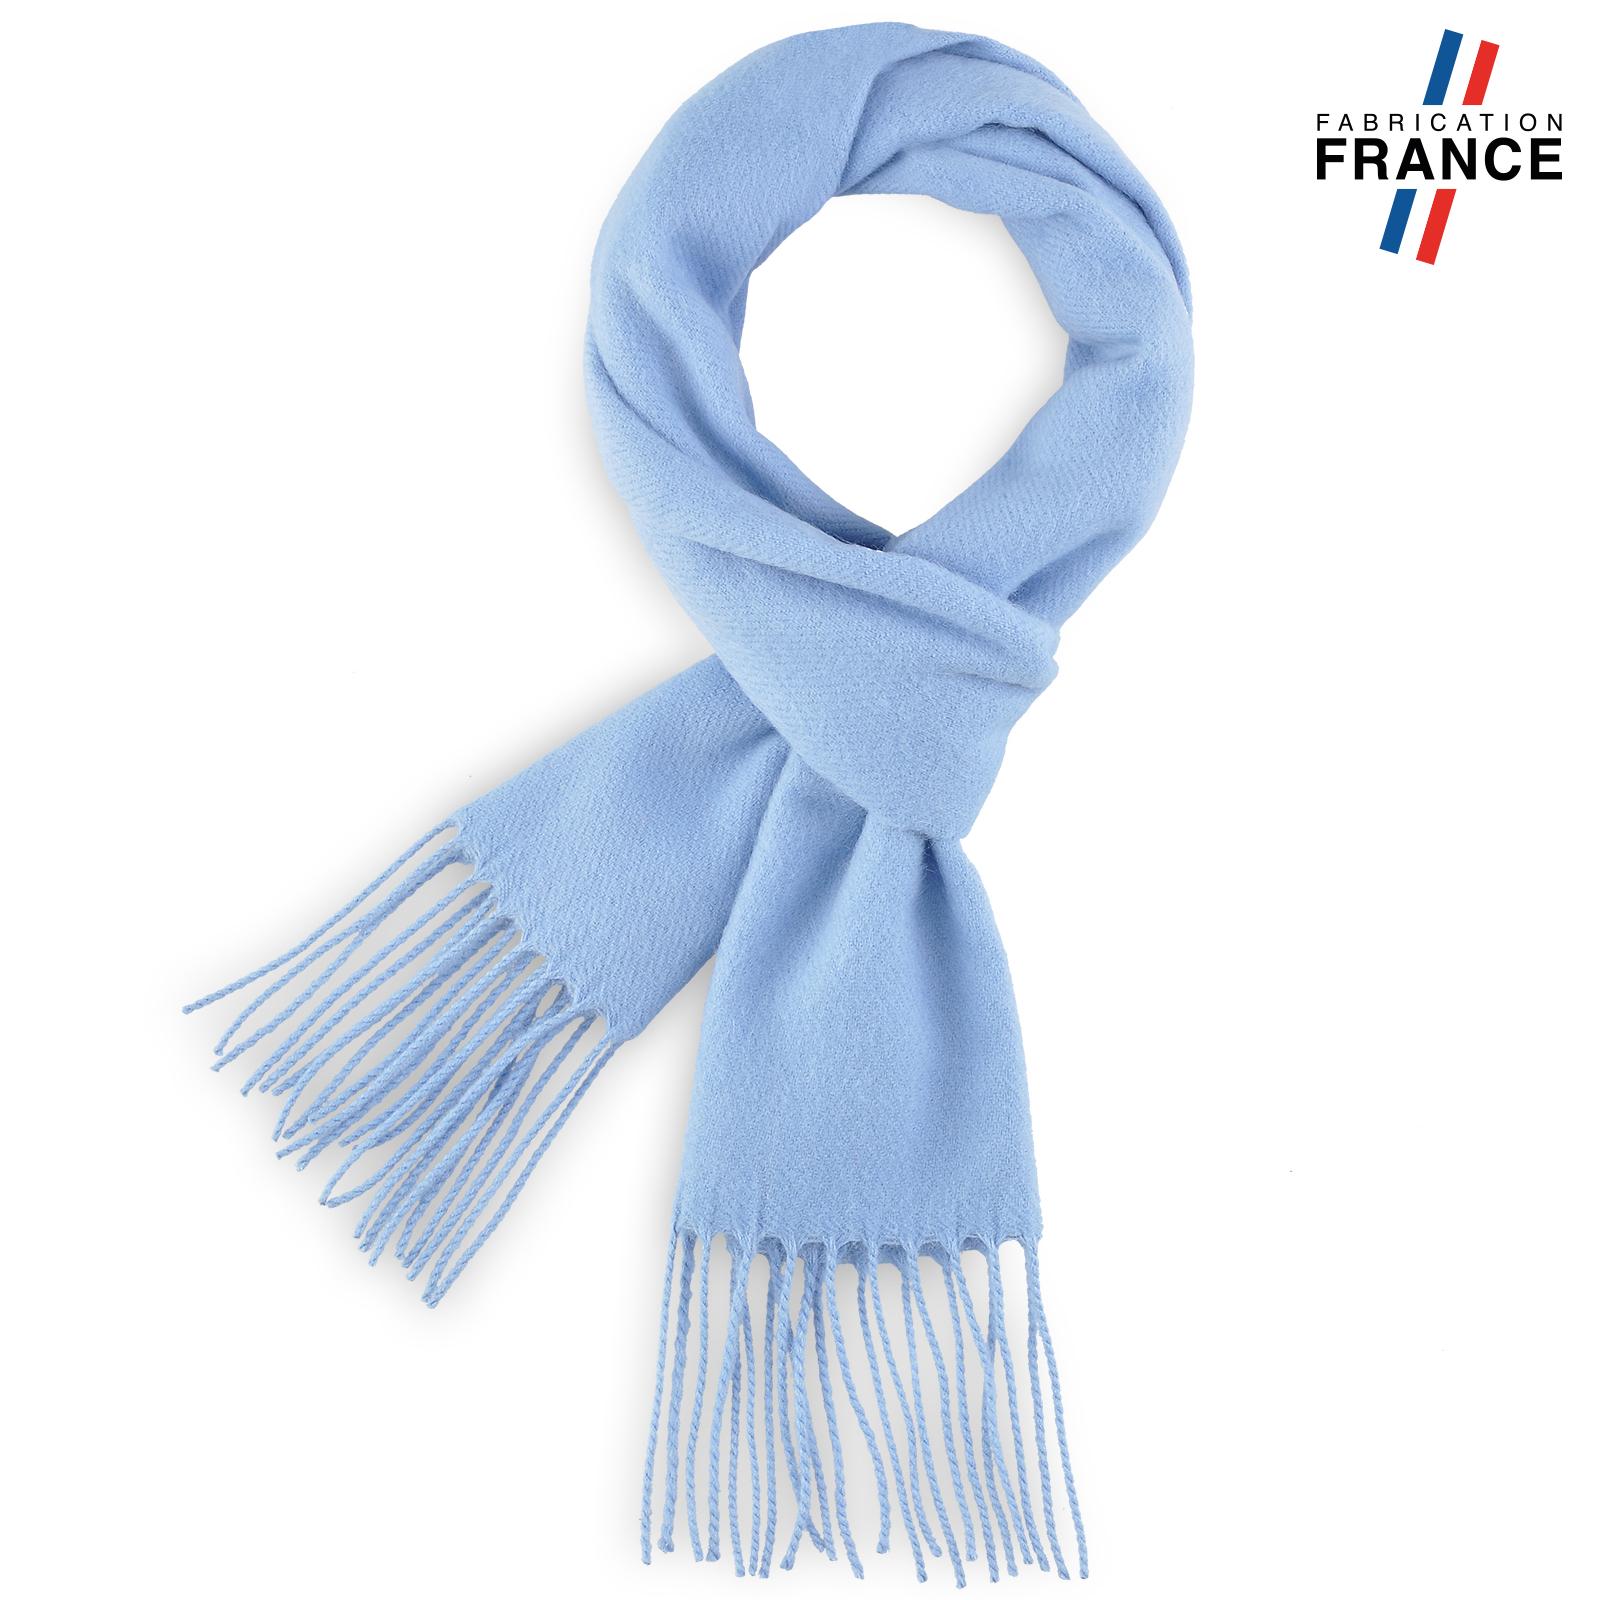 AT-03234-F16-echarpe-a-franges-bleu-ciel-fabrication-francaise